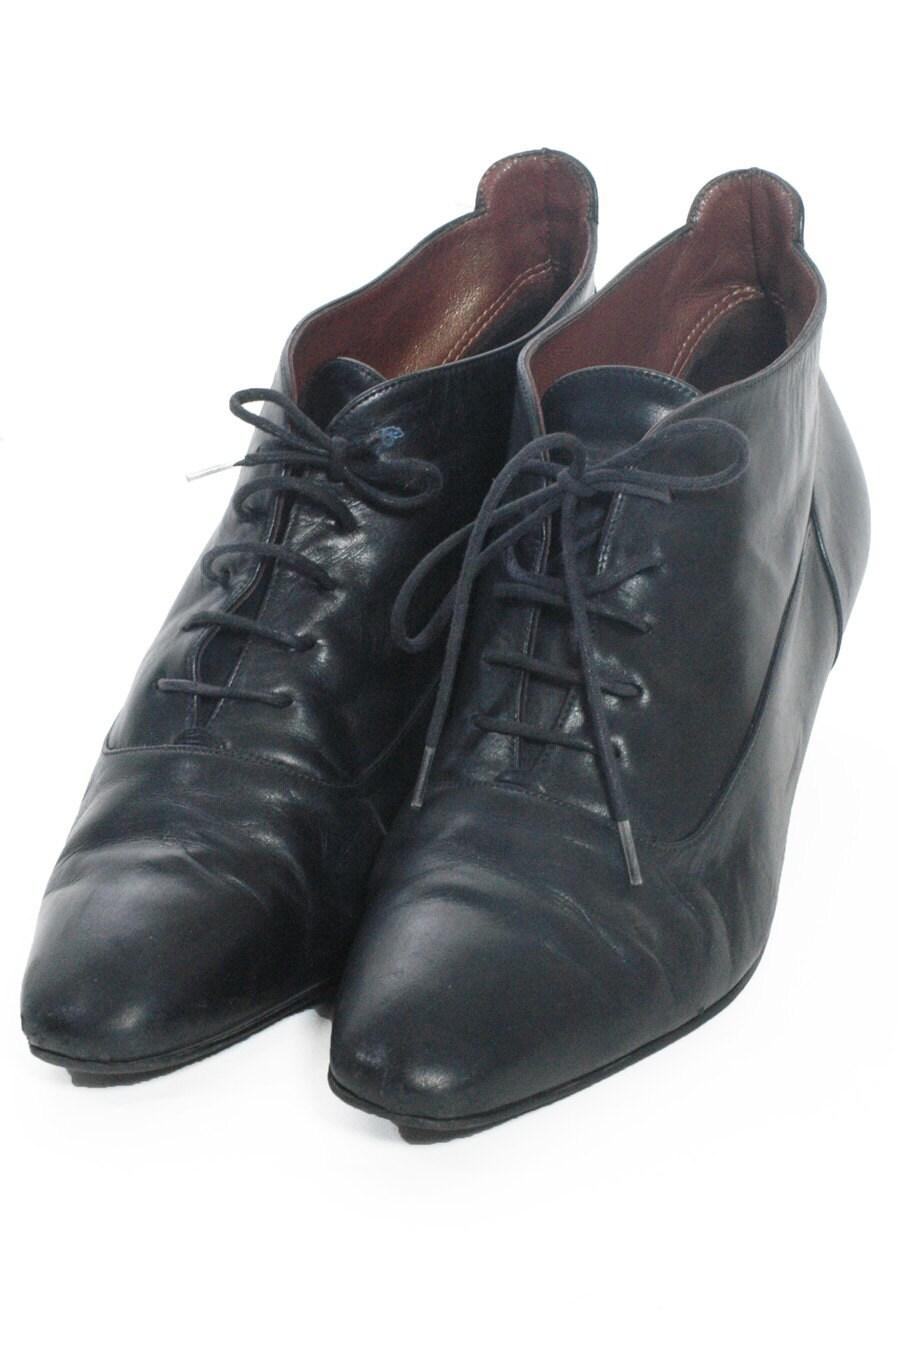 Vintage Black Leather Lace Up Ankle Boots 6 www.brickvintage.com